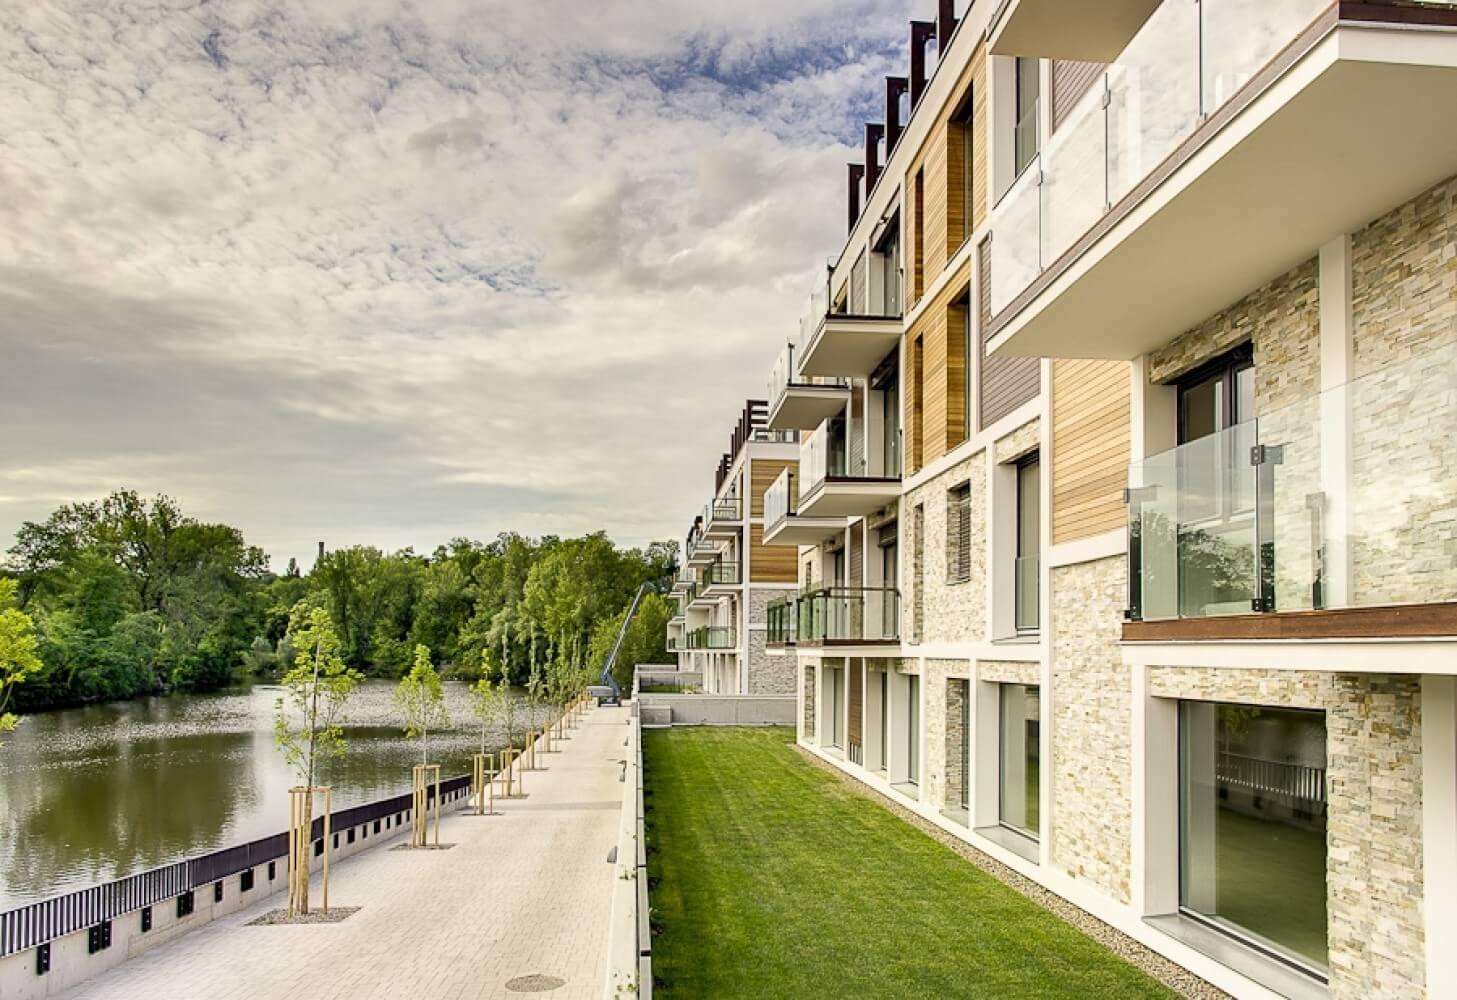 Продажа квартир в резиденции на набережной в Праге 8